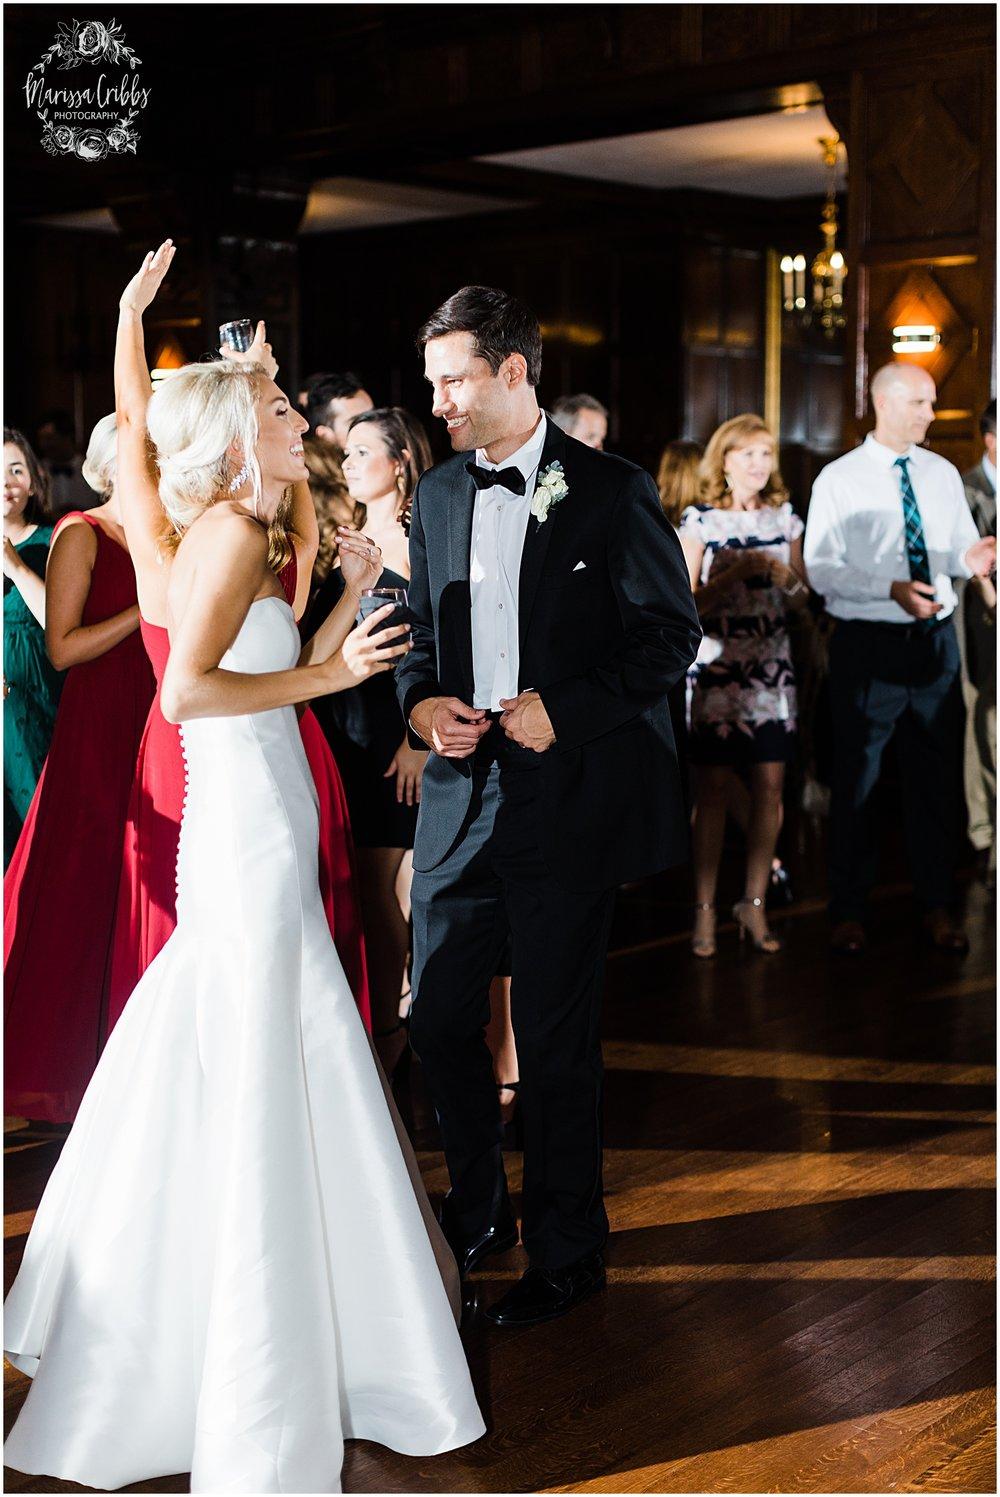 NOLL WEDDING | THE BRASS ON BALTIMORE | MARISSA CRIBBS PHOTOGRAPHY_6390.jpg